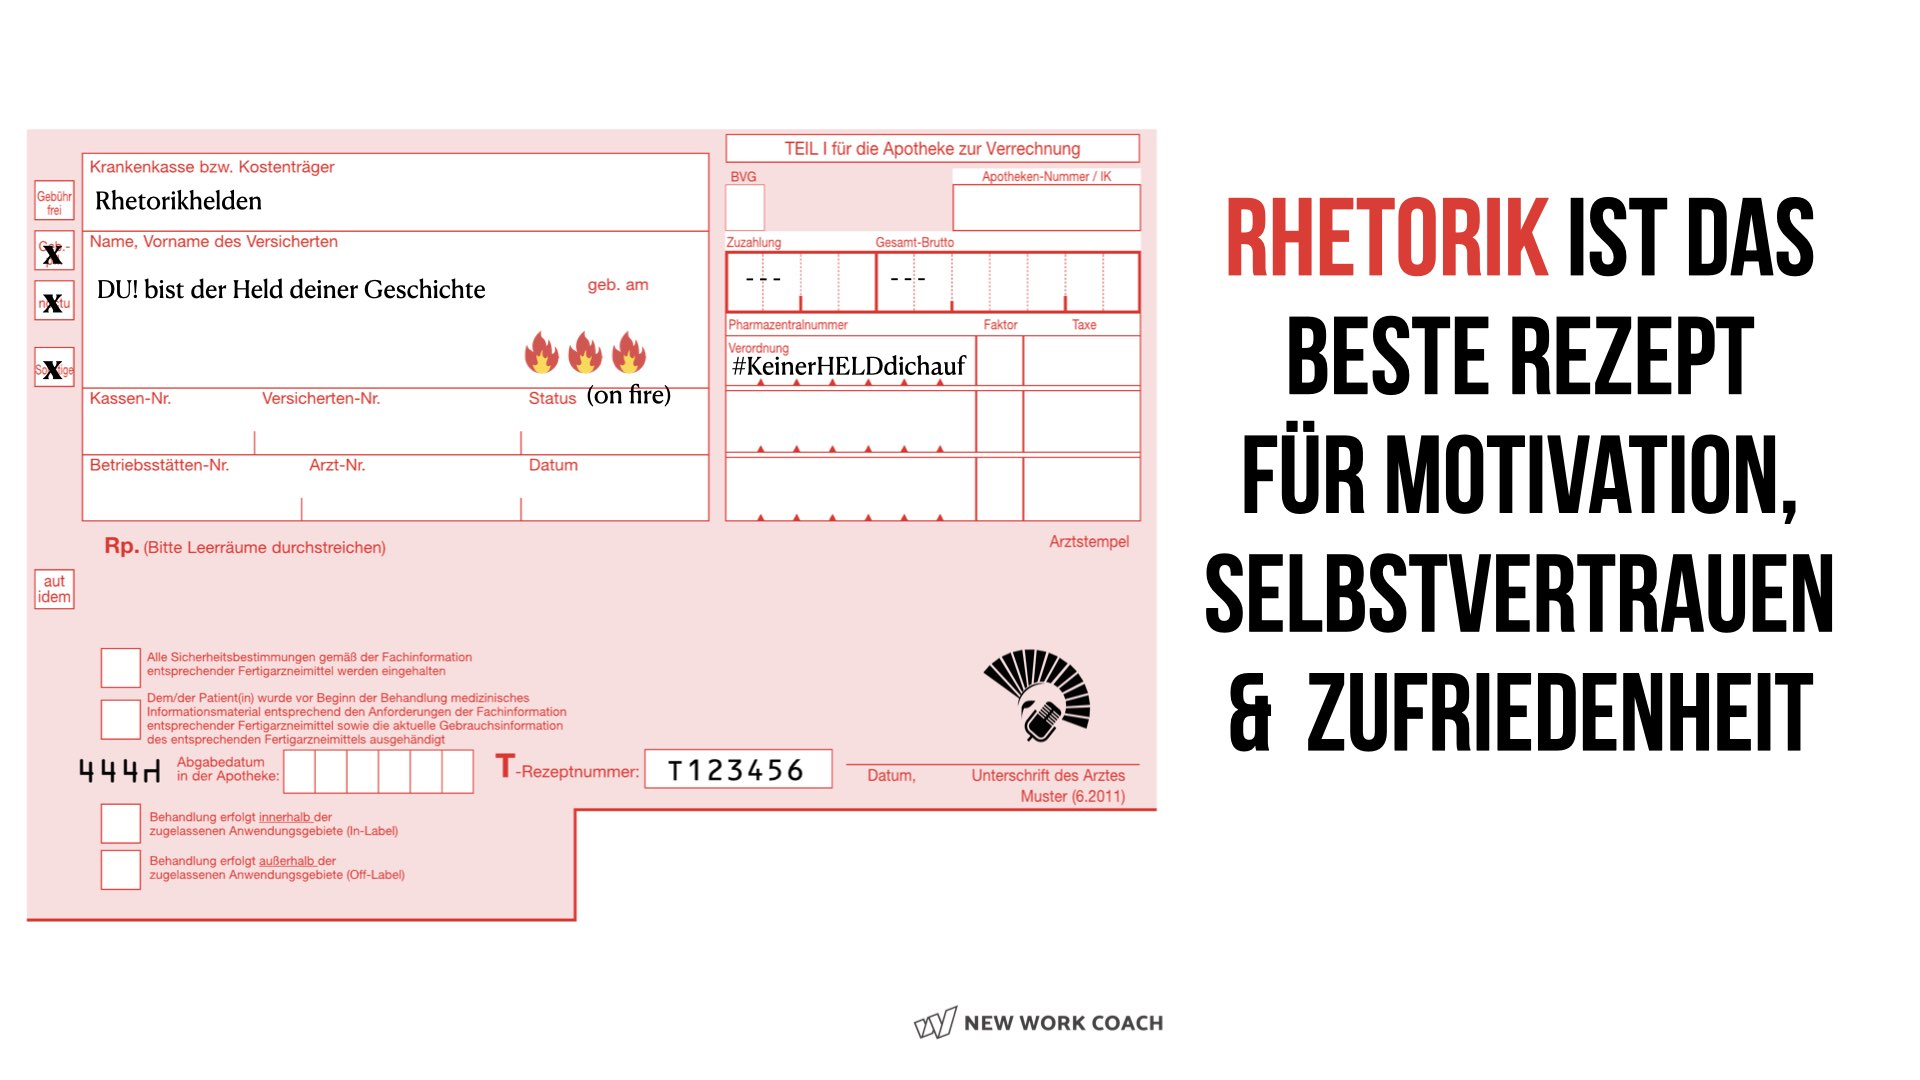 patentrezept-rhetorik-new-work-coach-rhe